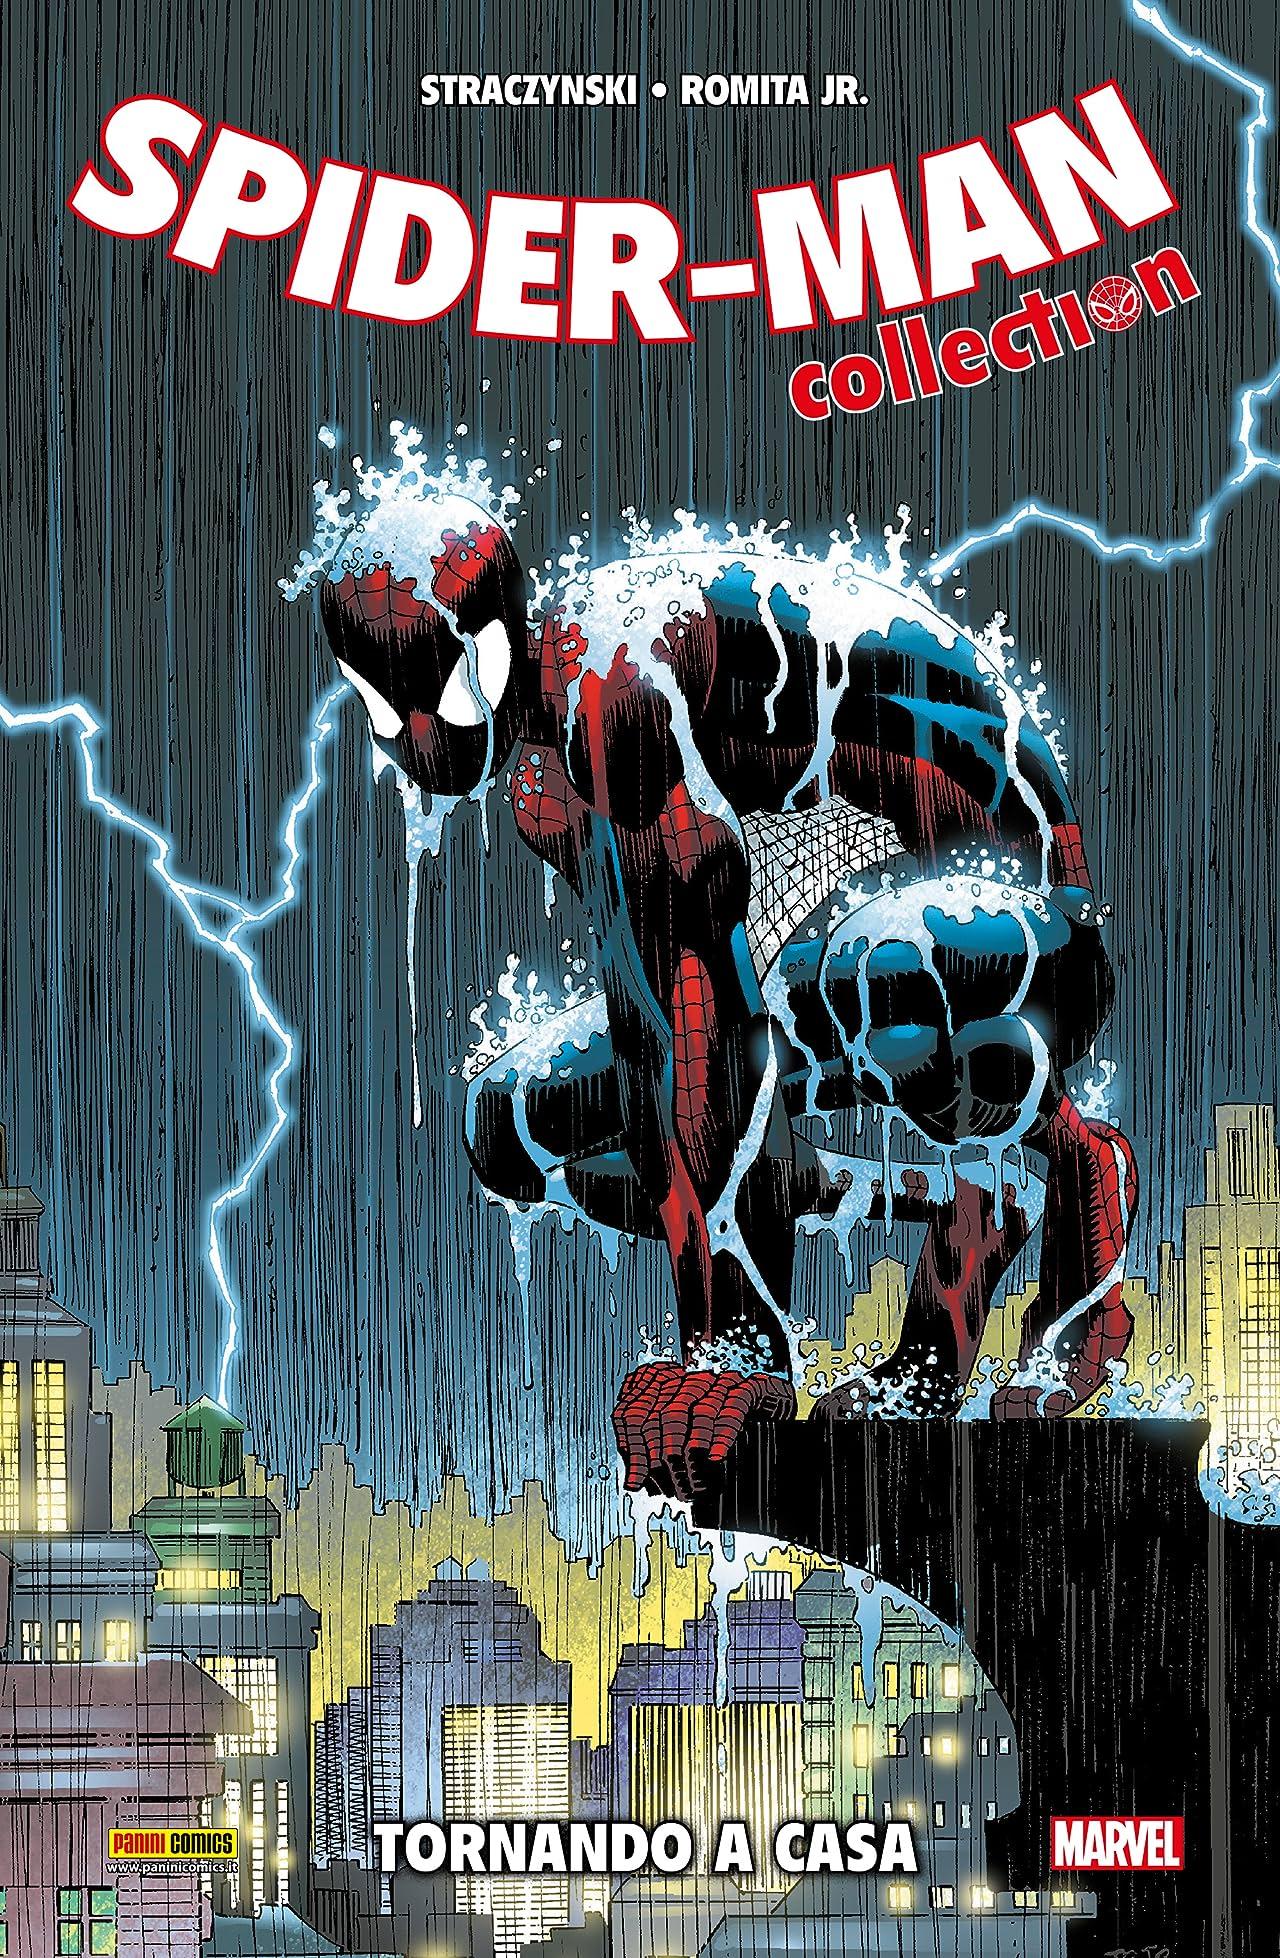 Spider-Man: Tornando A Casa